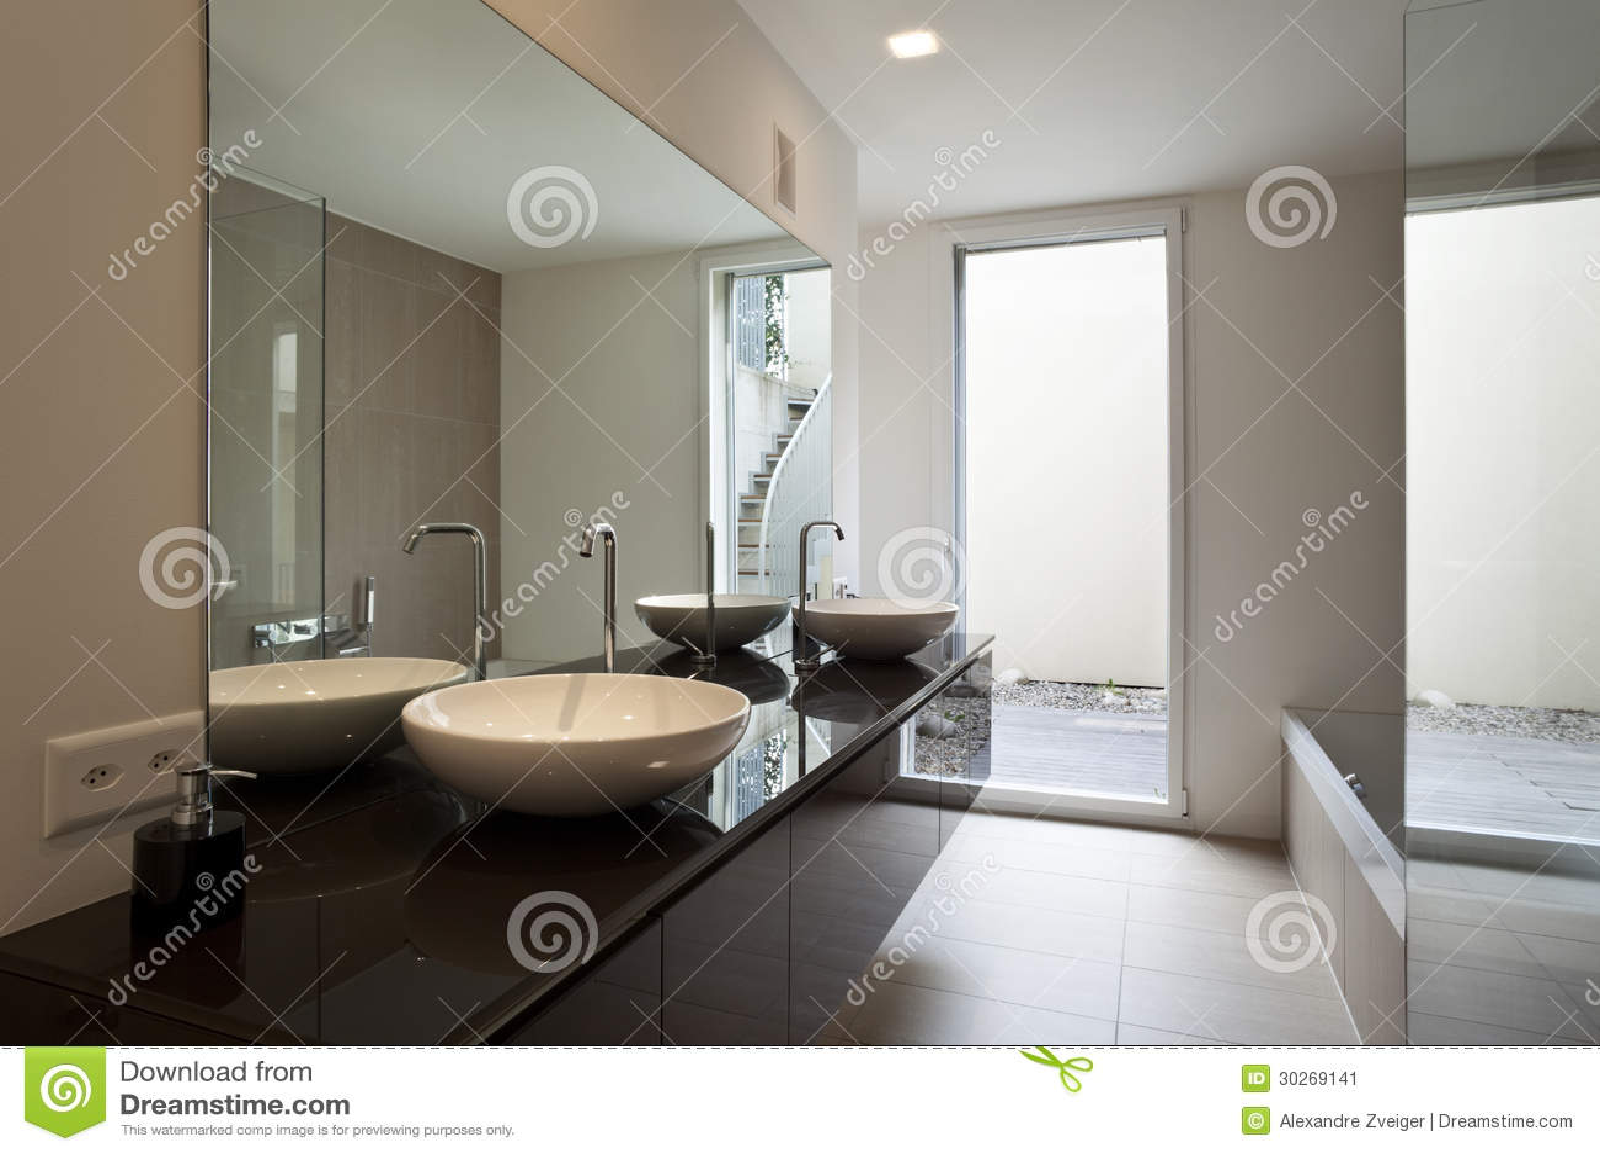 Casa moderna interior banheiro bonito. #82A328 1300x955 Banheiro Bonito